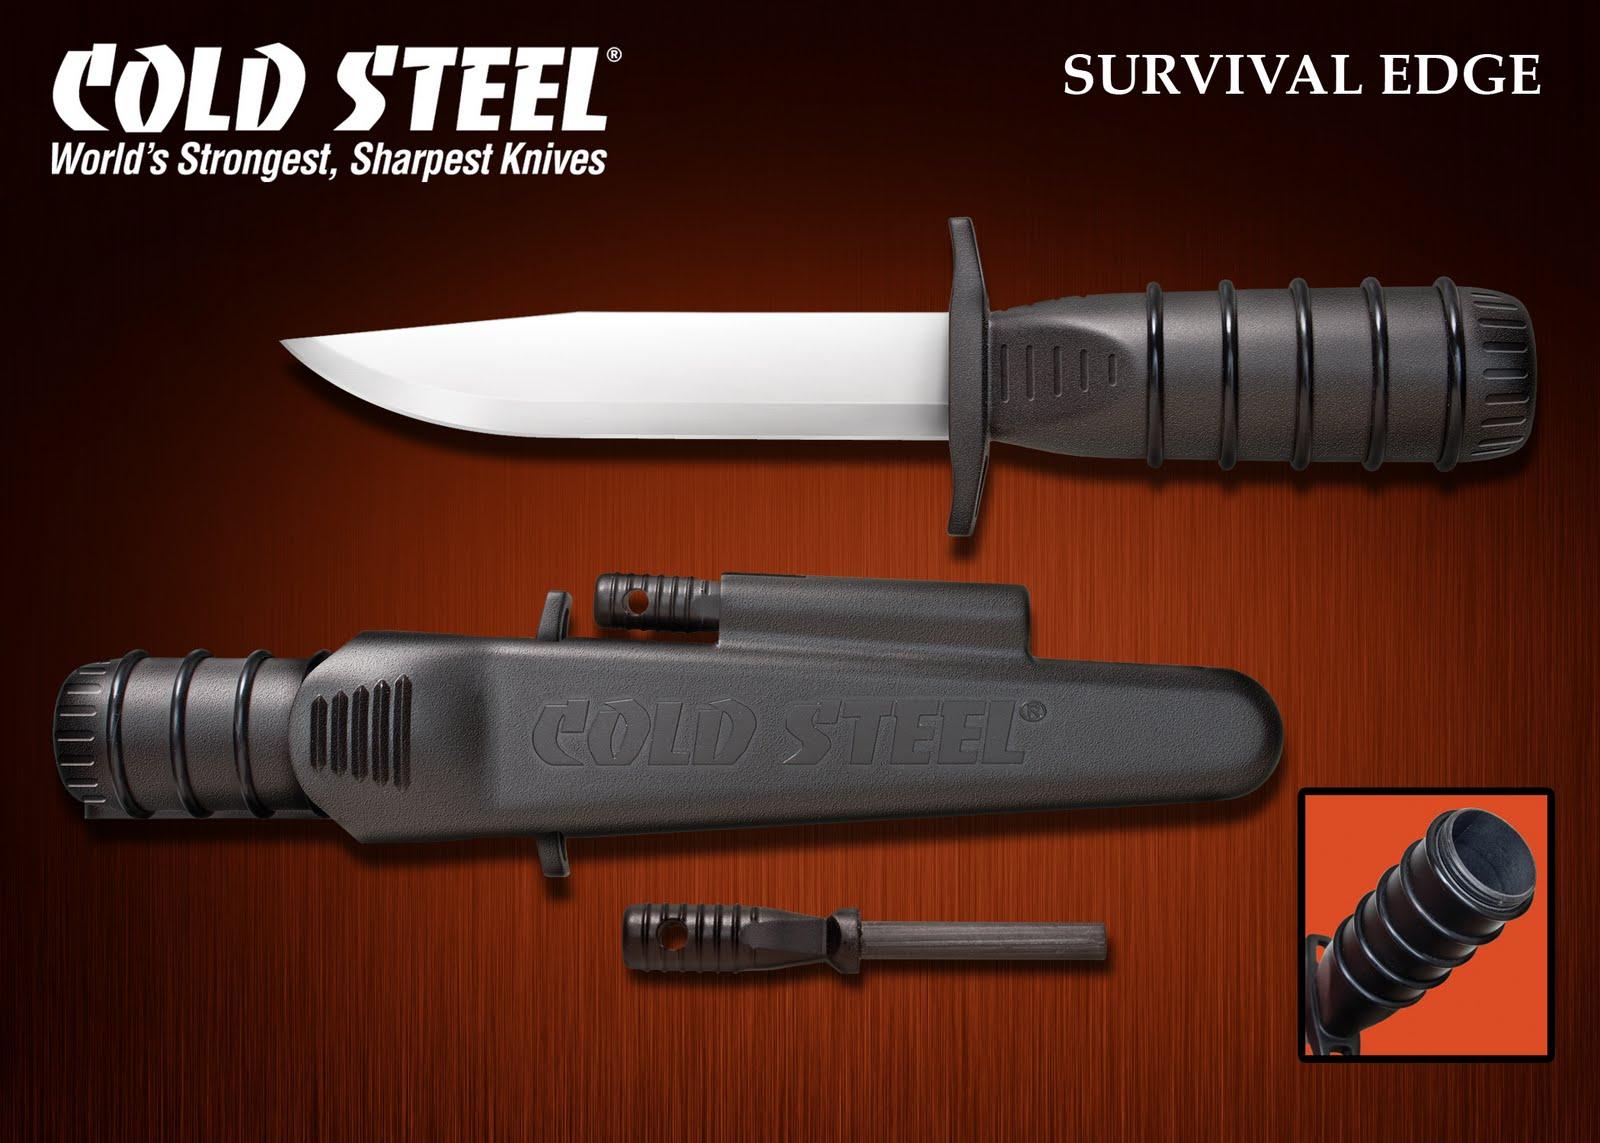 Нож cold steel survival edge black нож для разделки и зачистки кабеля